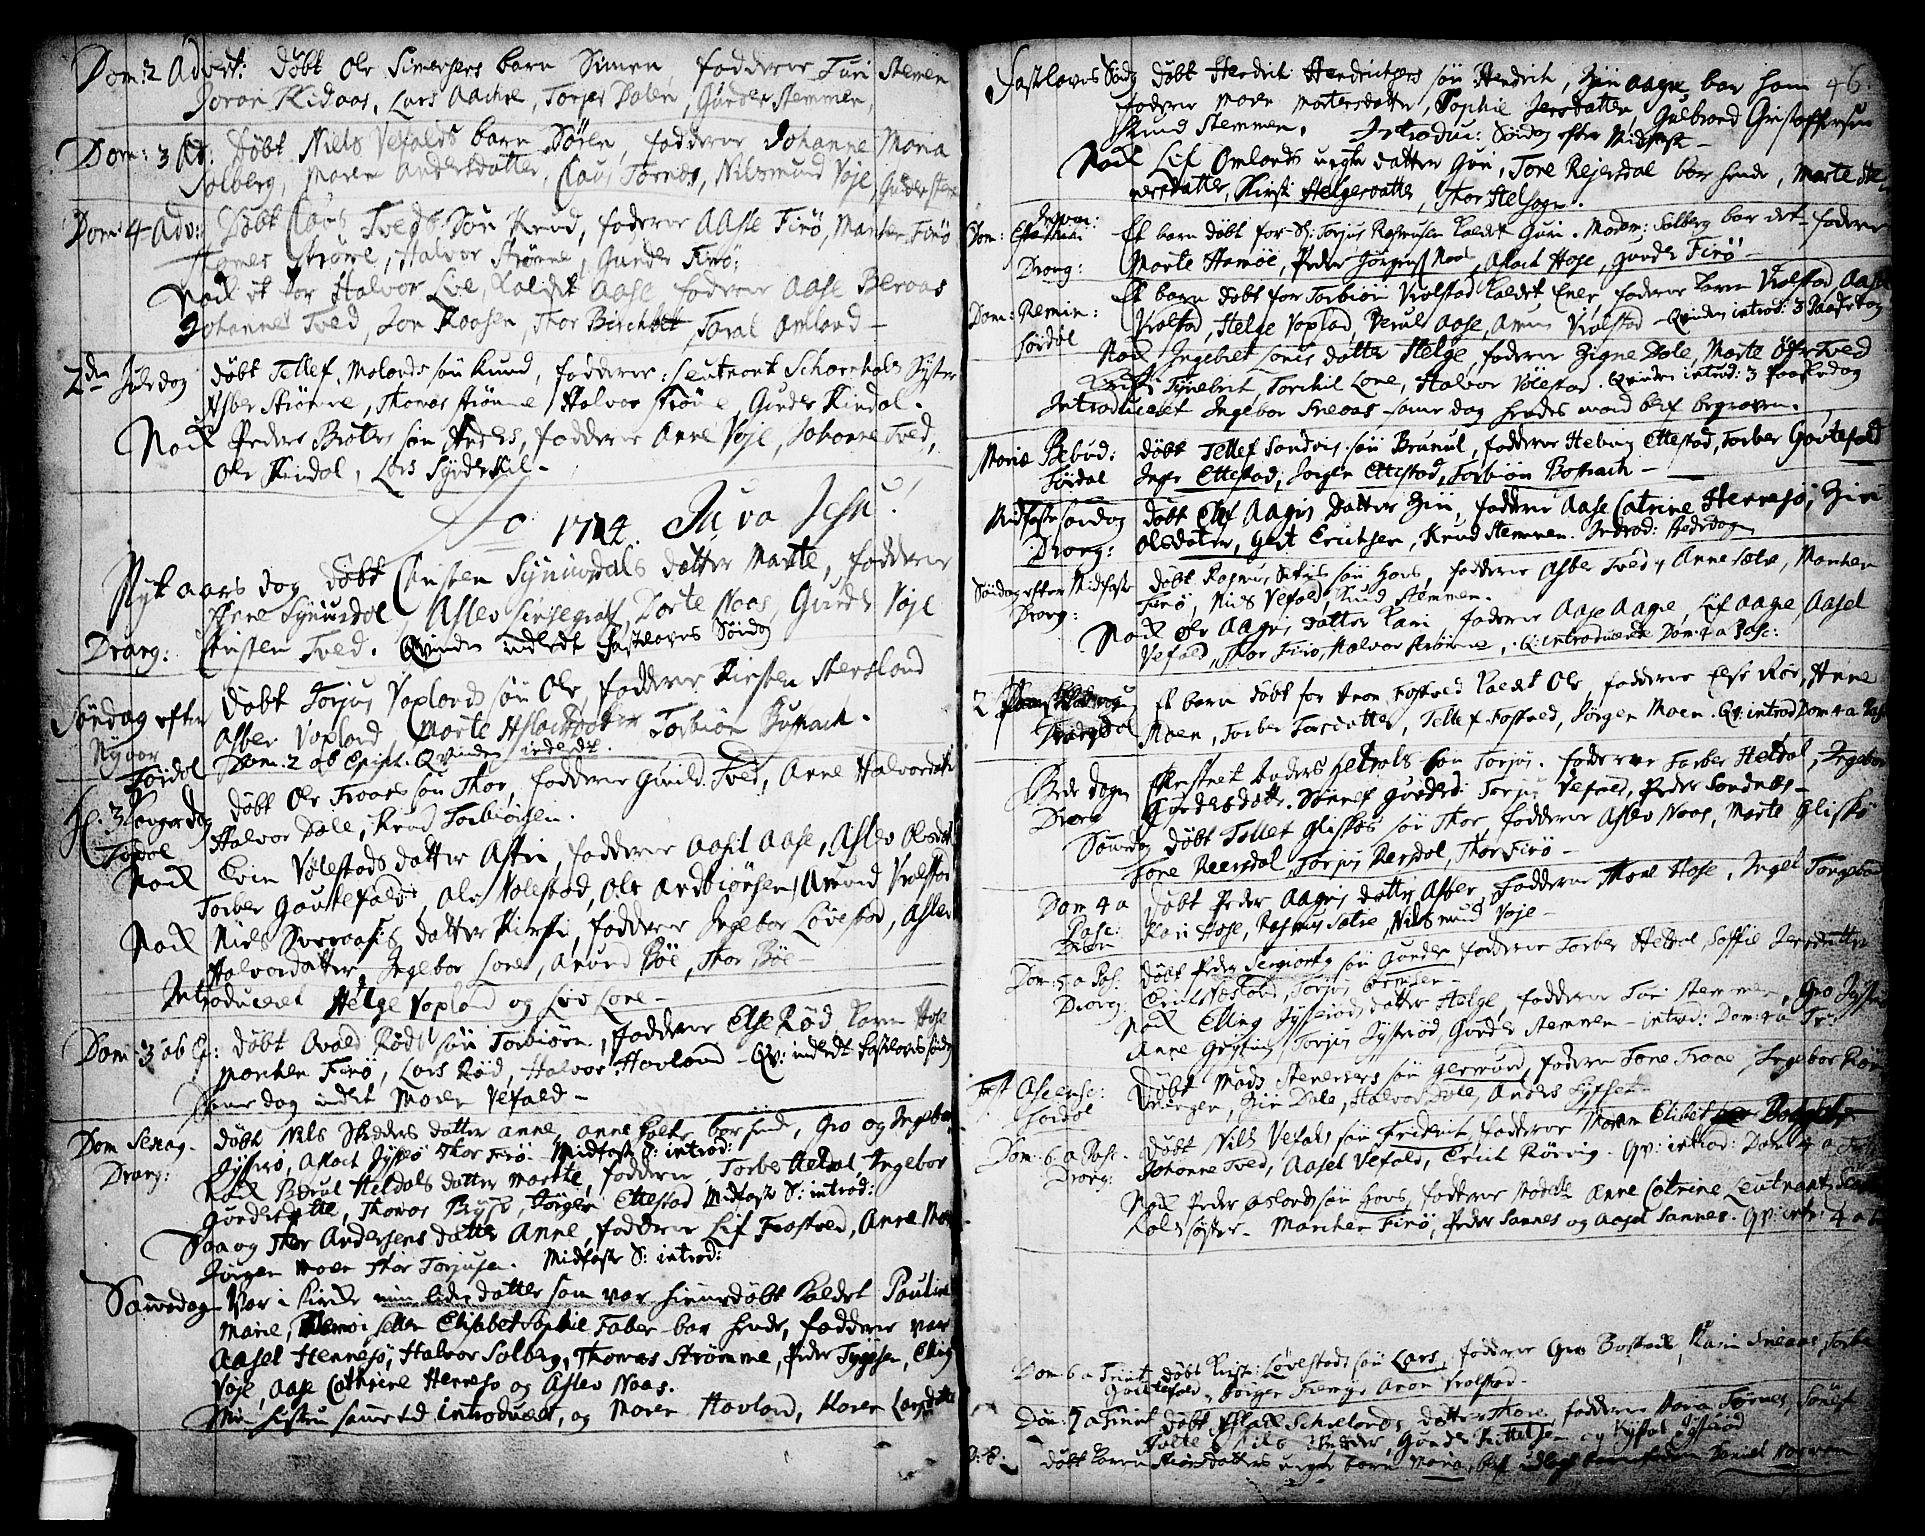 SAKO, Drangedal kirkebøker, F/Fa/L0001: Ministerialbok nr. 1, 1697-1767, s. 46